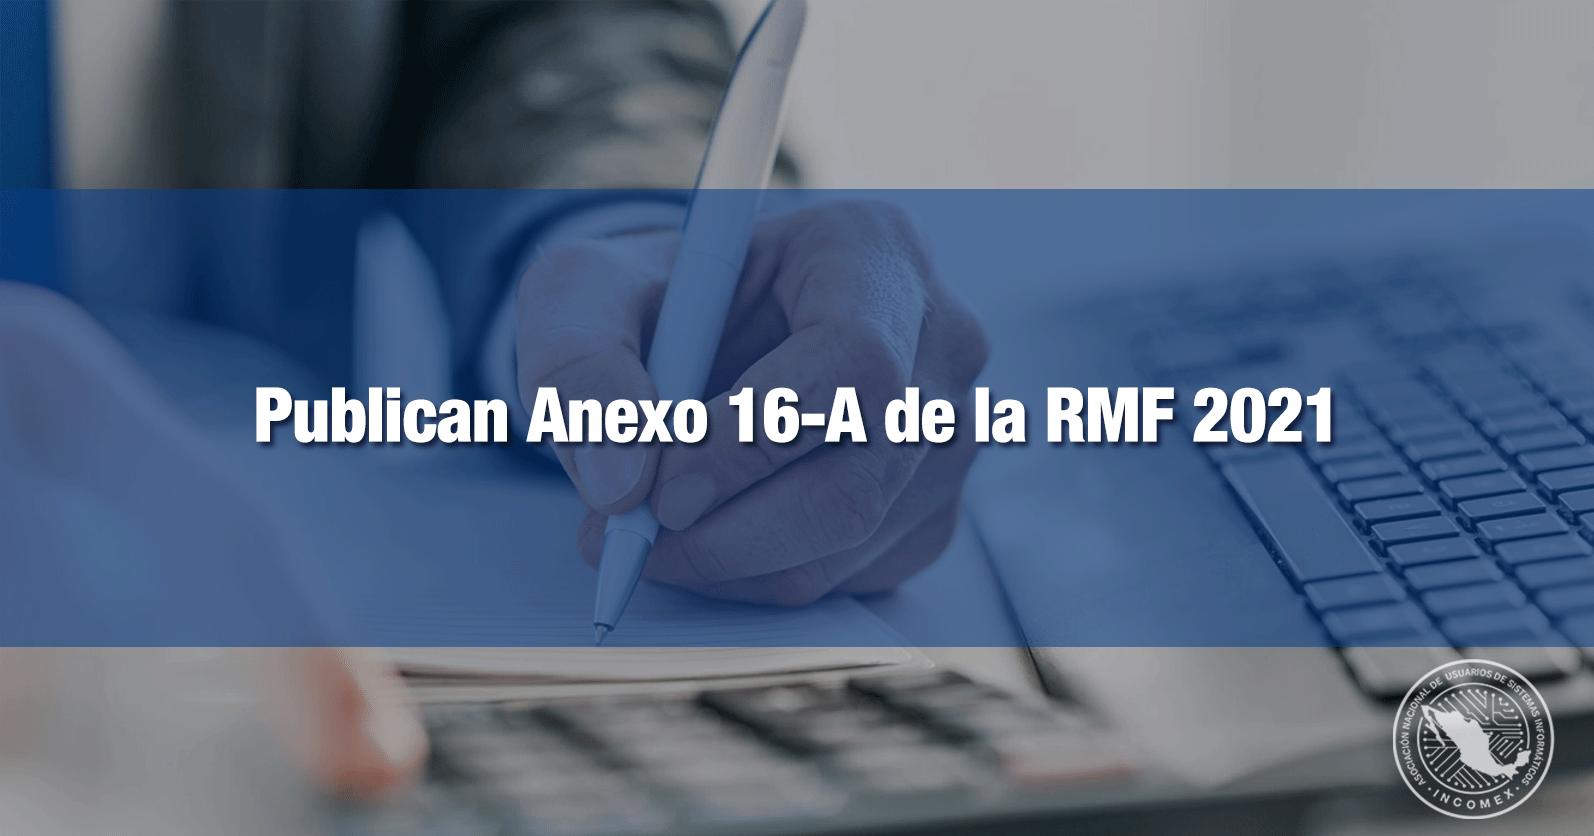 Publican Anexo 16-A de la RMF 2021